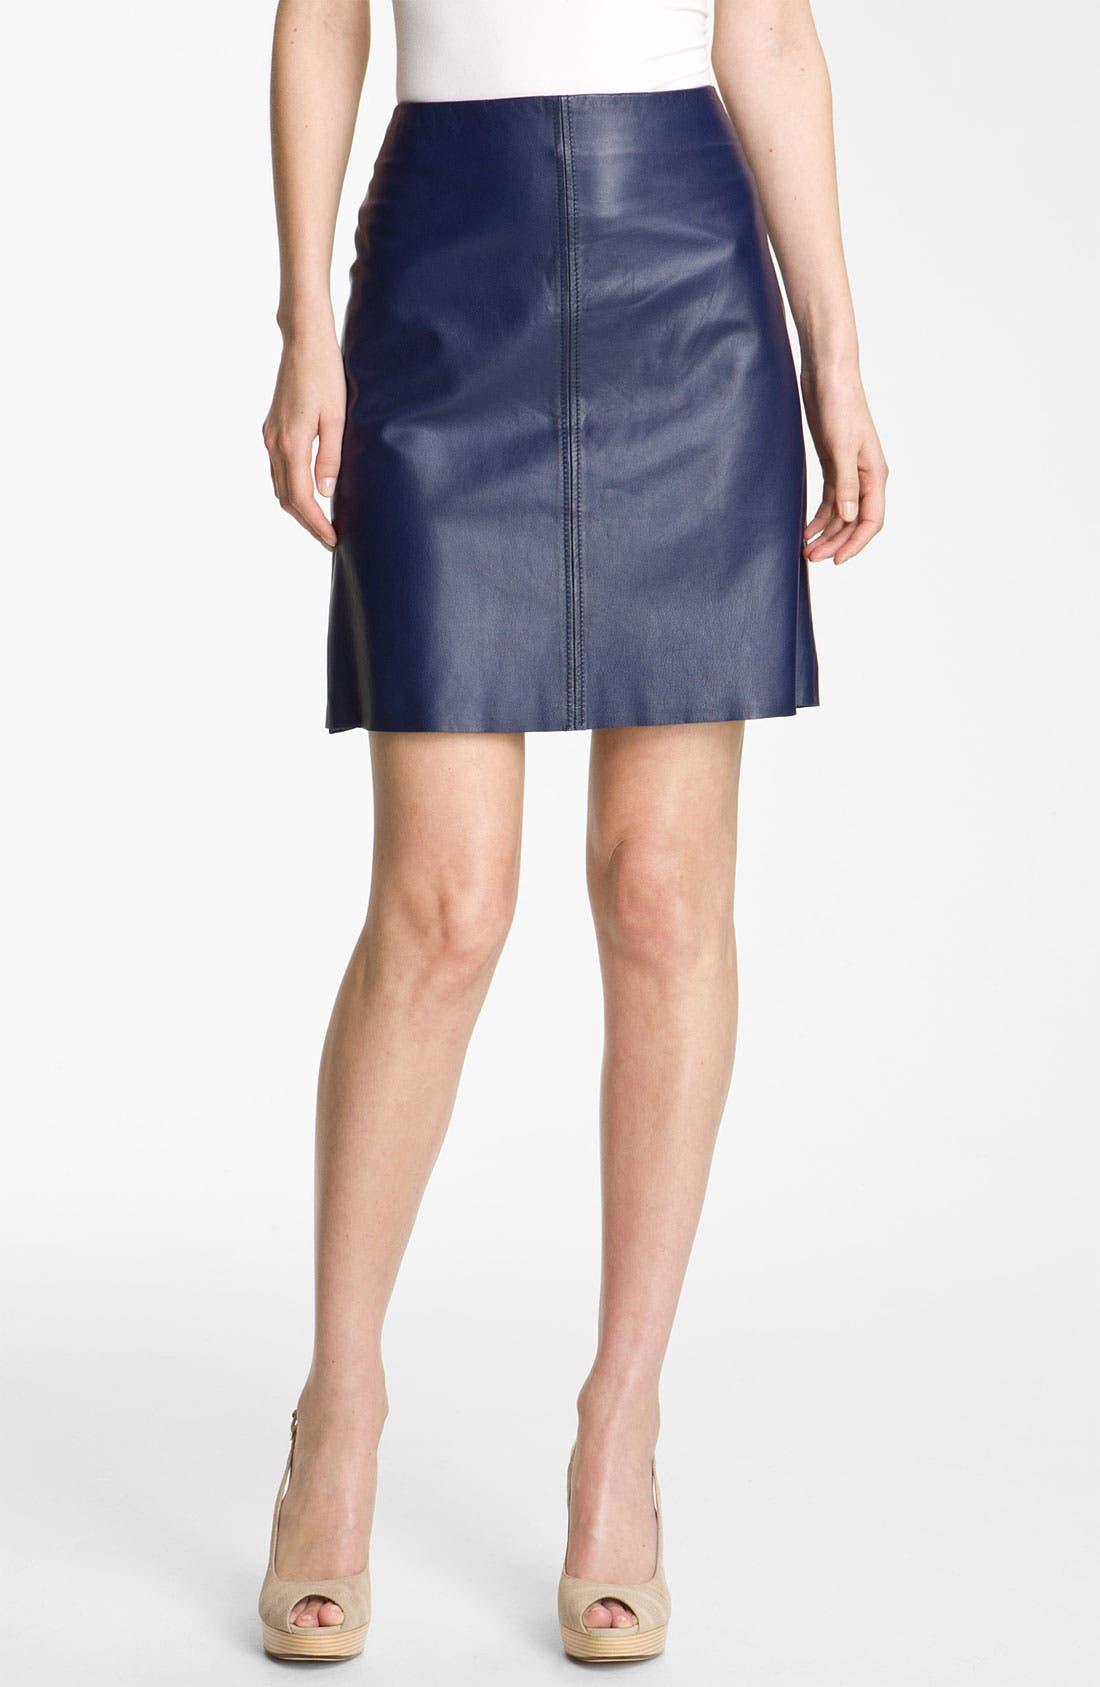 Main Image - Weekend Max Mara 'Affine' Leather Skirt